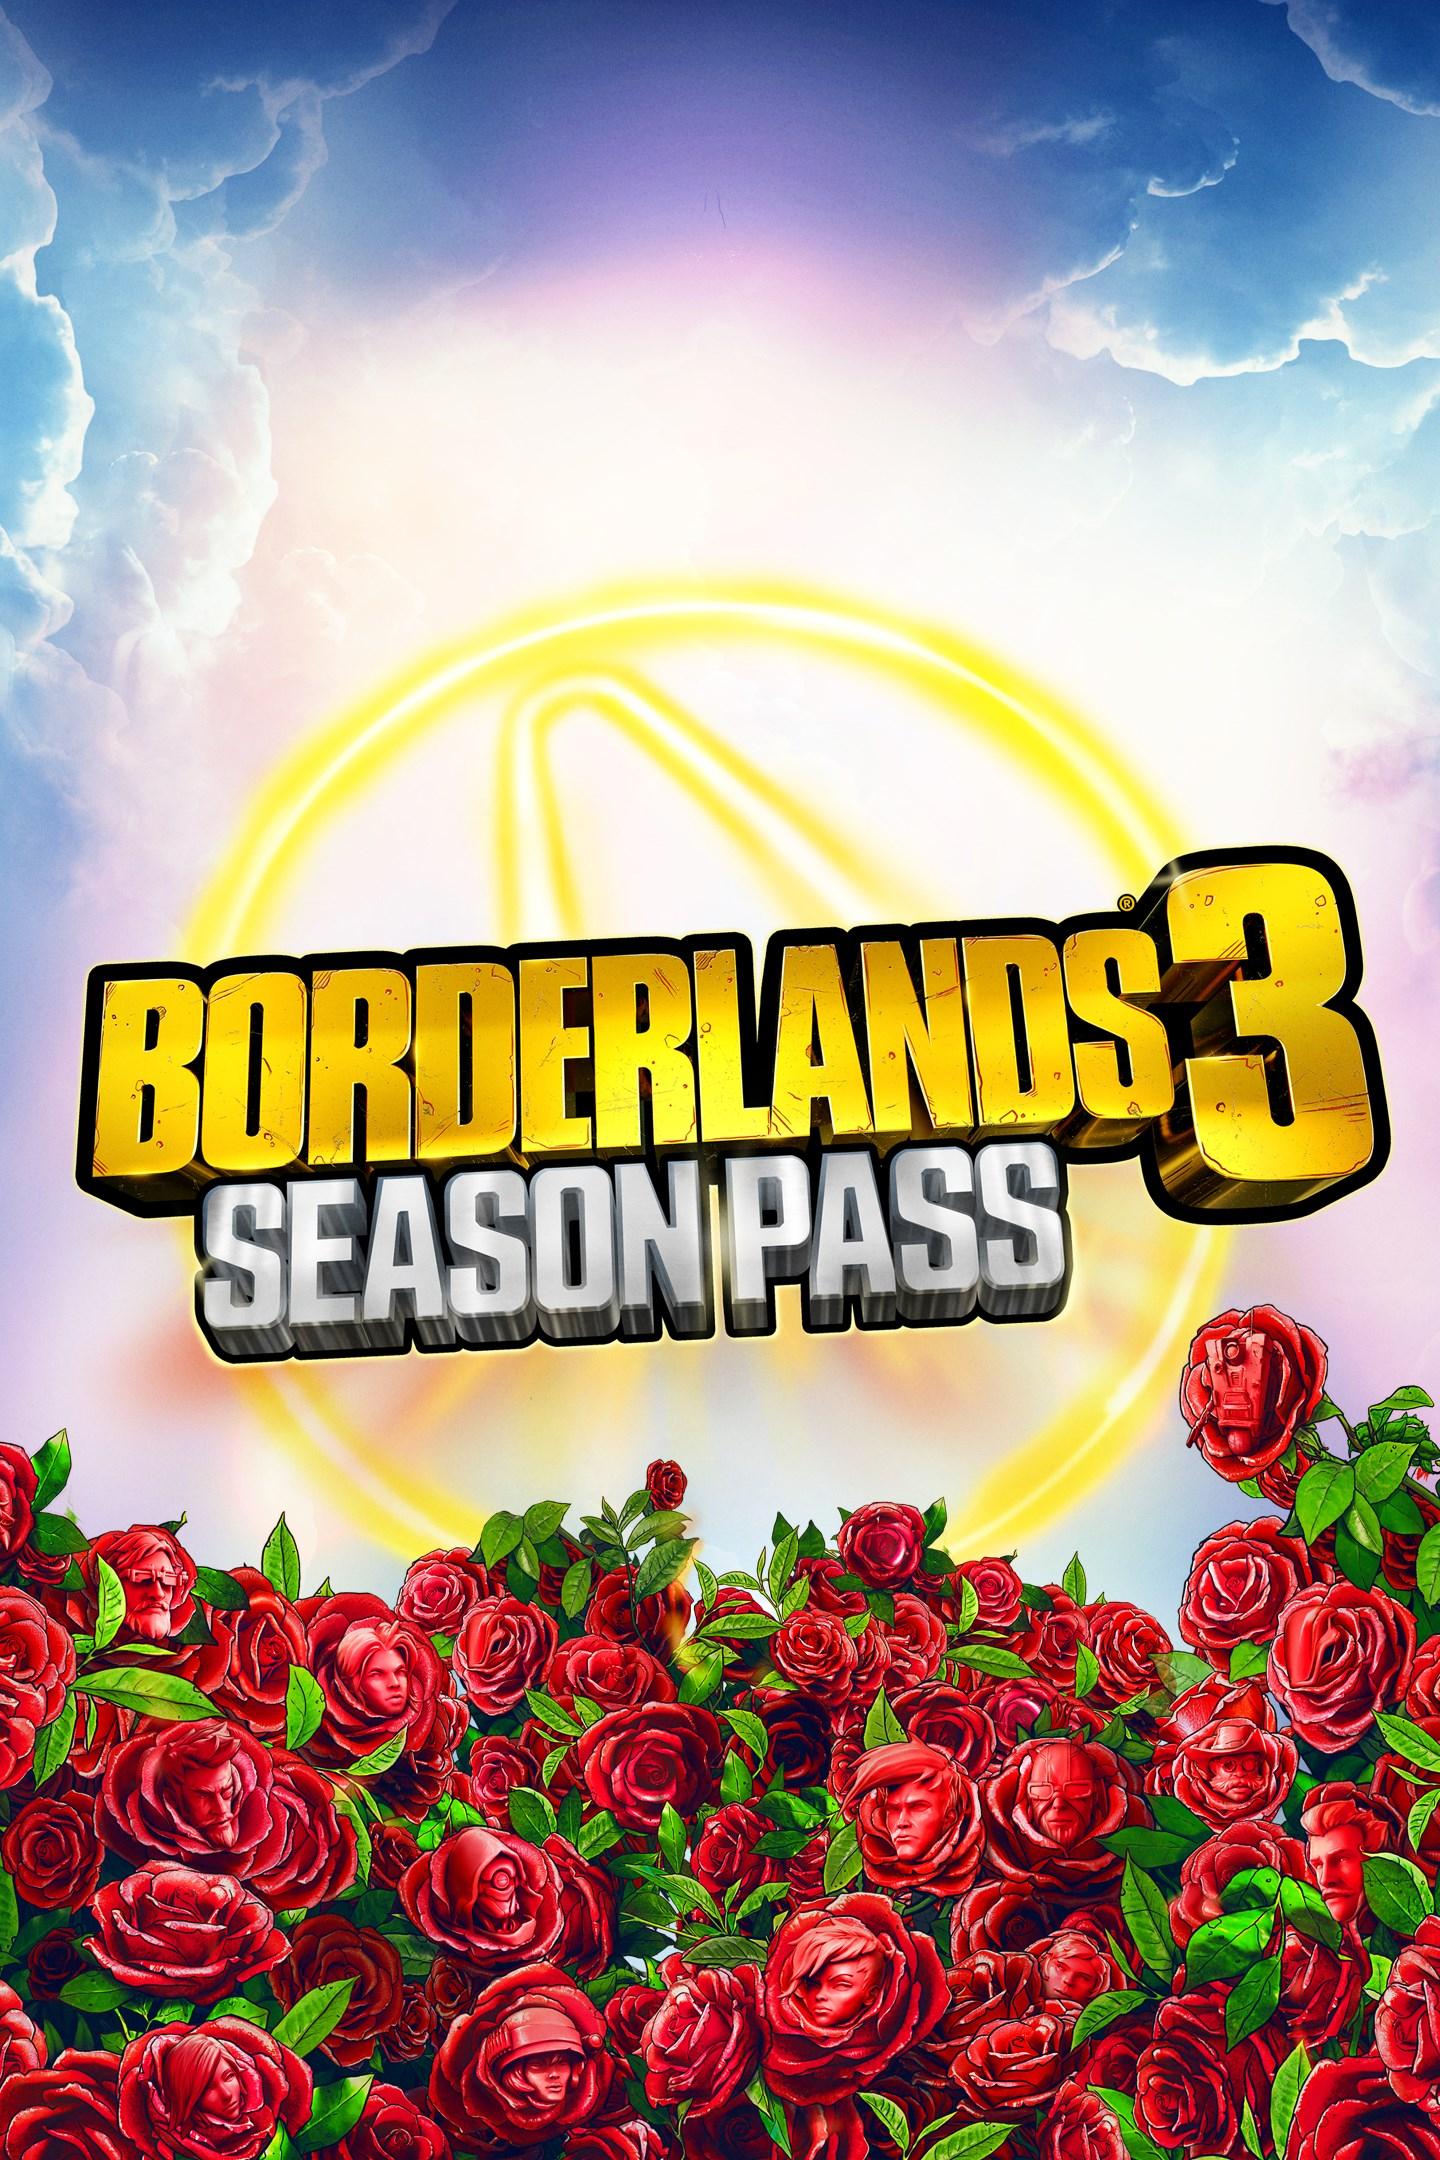 Xbox one borderlands 3 season pass £9.53 via Microsoft Brazil store (Gold Members only)